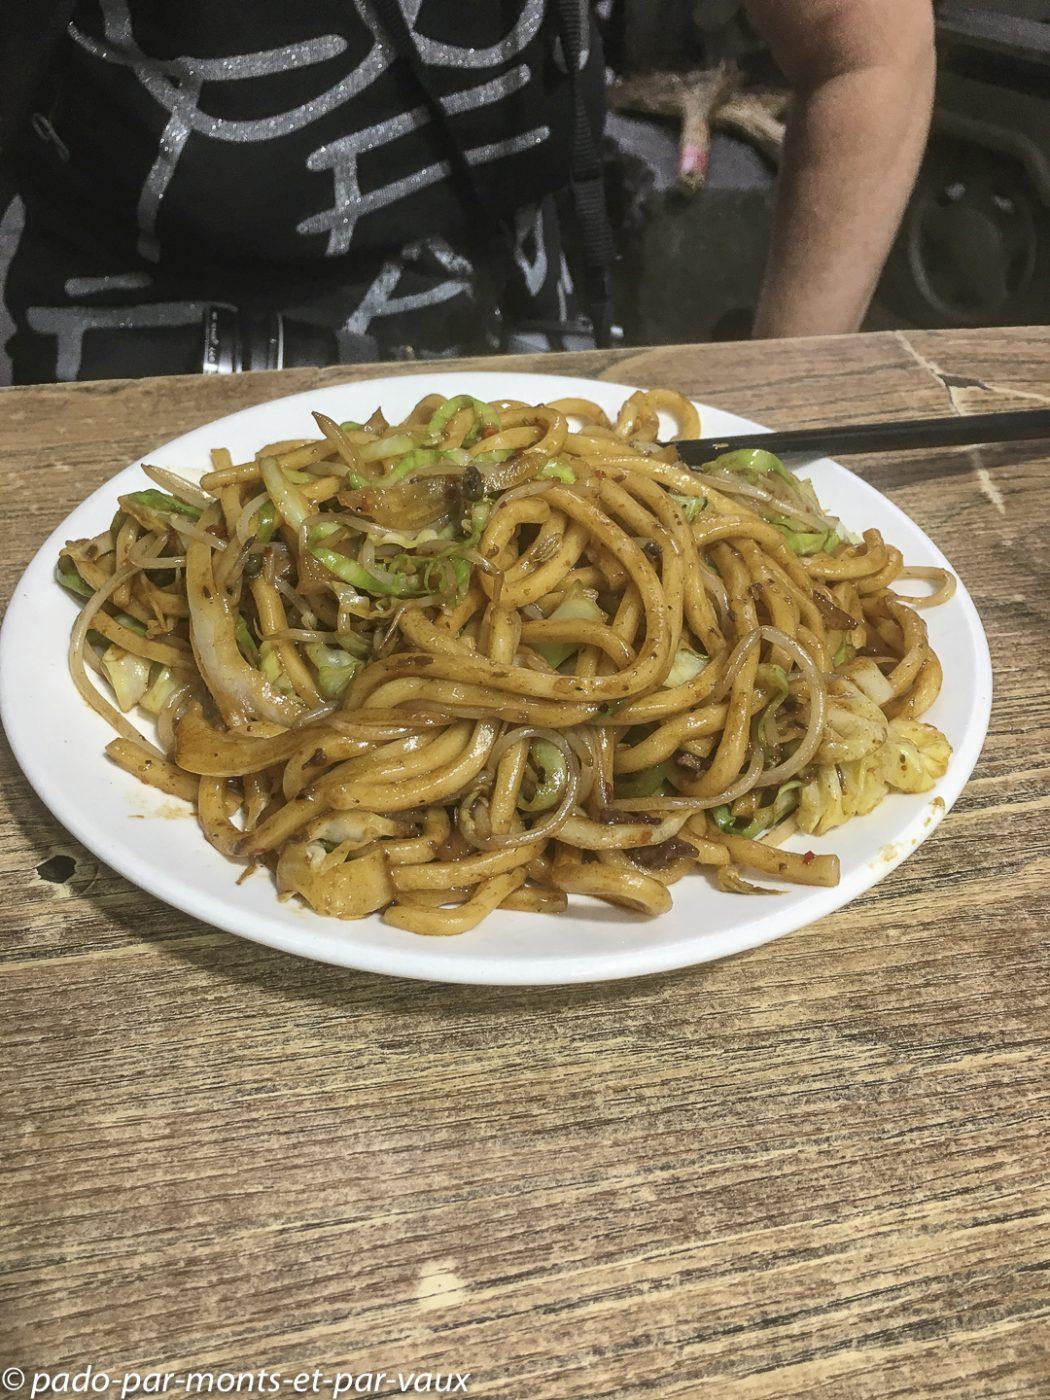 Xian  notre plat de nouilles